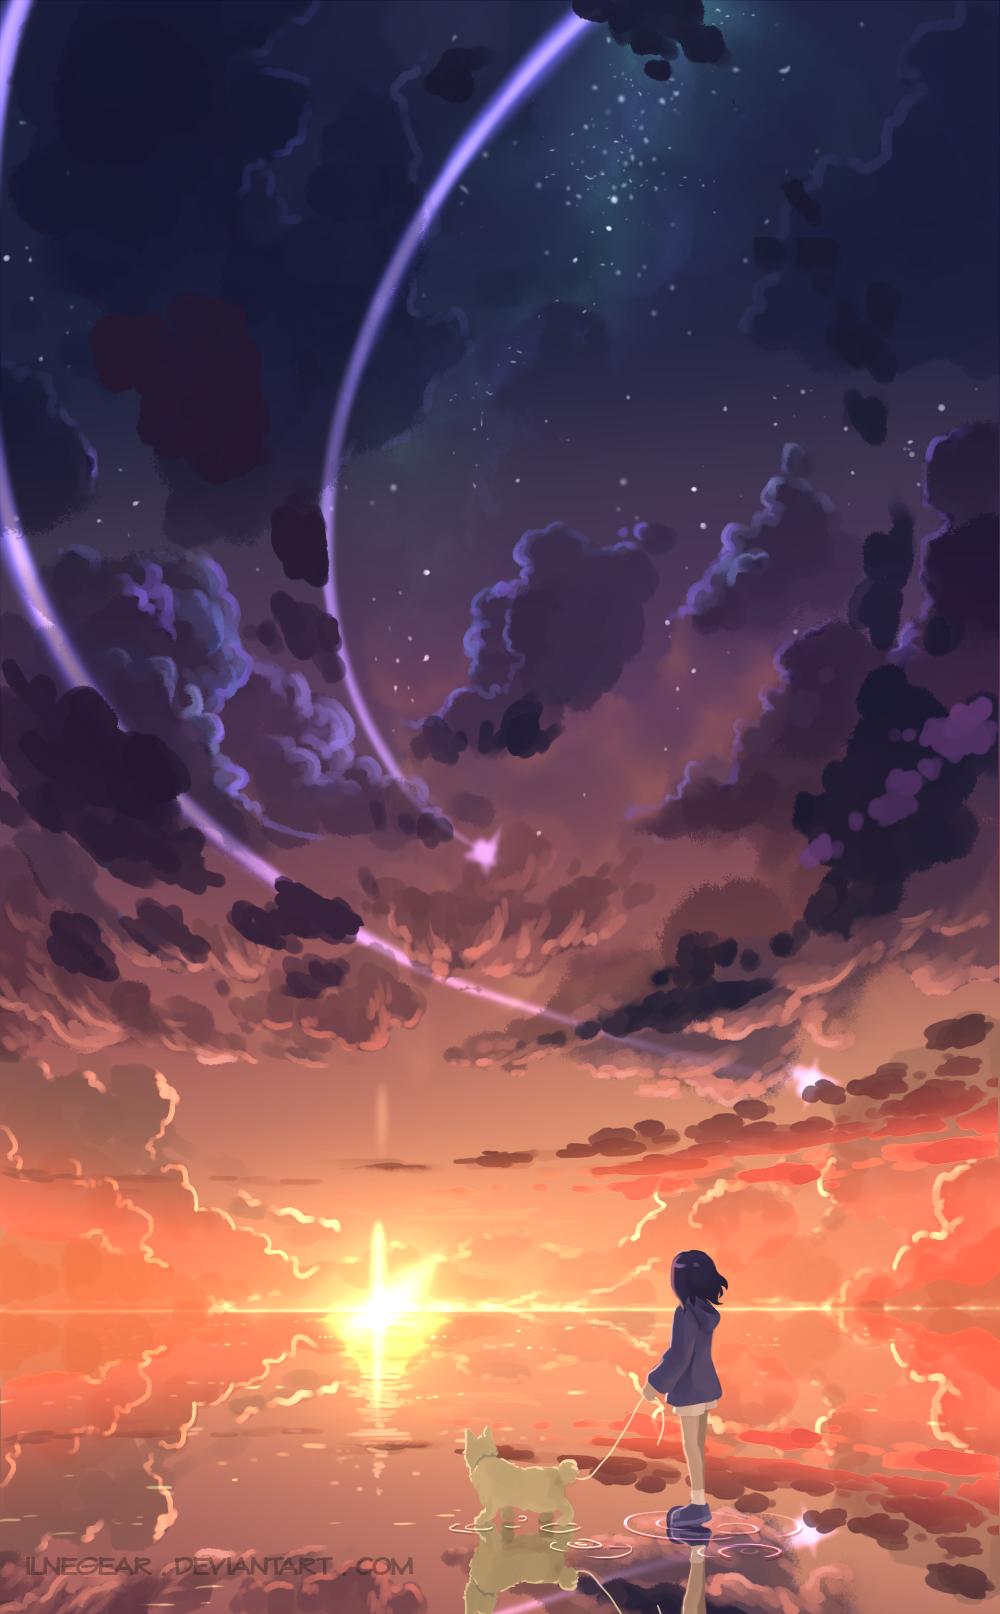 Wallpaper Digital Art Sunset Meteors Portrait Display